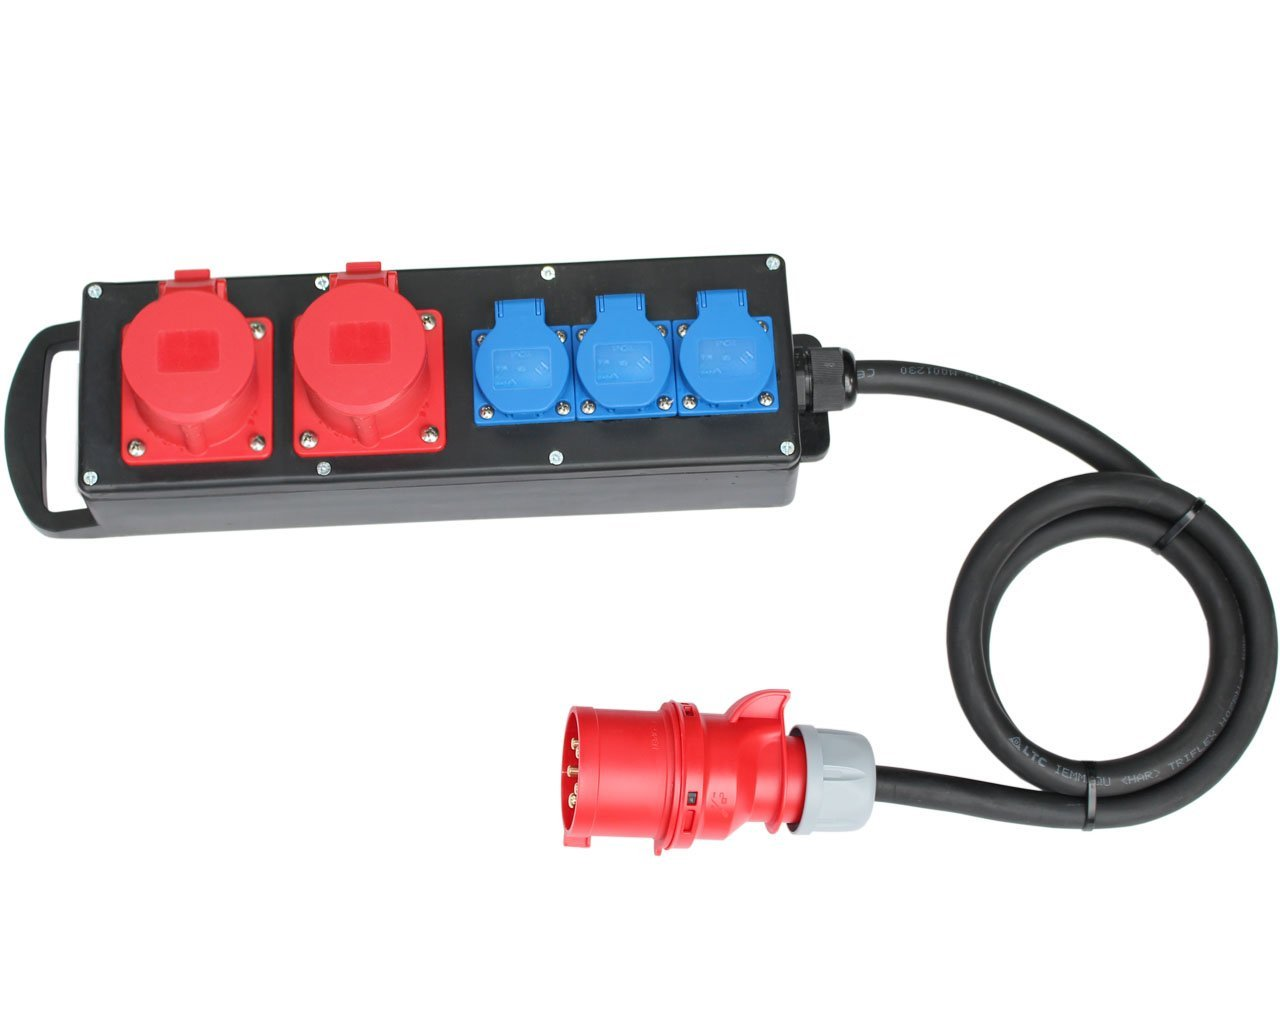 CEE Stromverteiler Vollgummi Baustromverteiler 16A / 400V zu 2x16A 3x230V